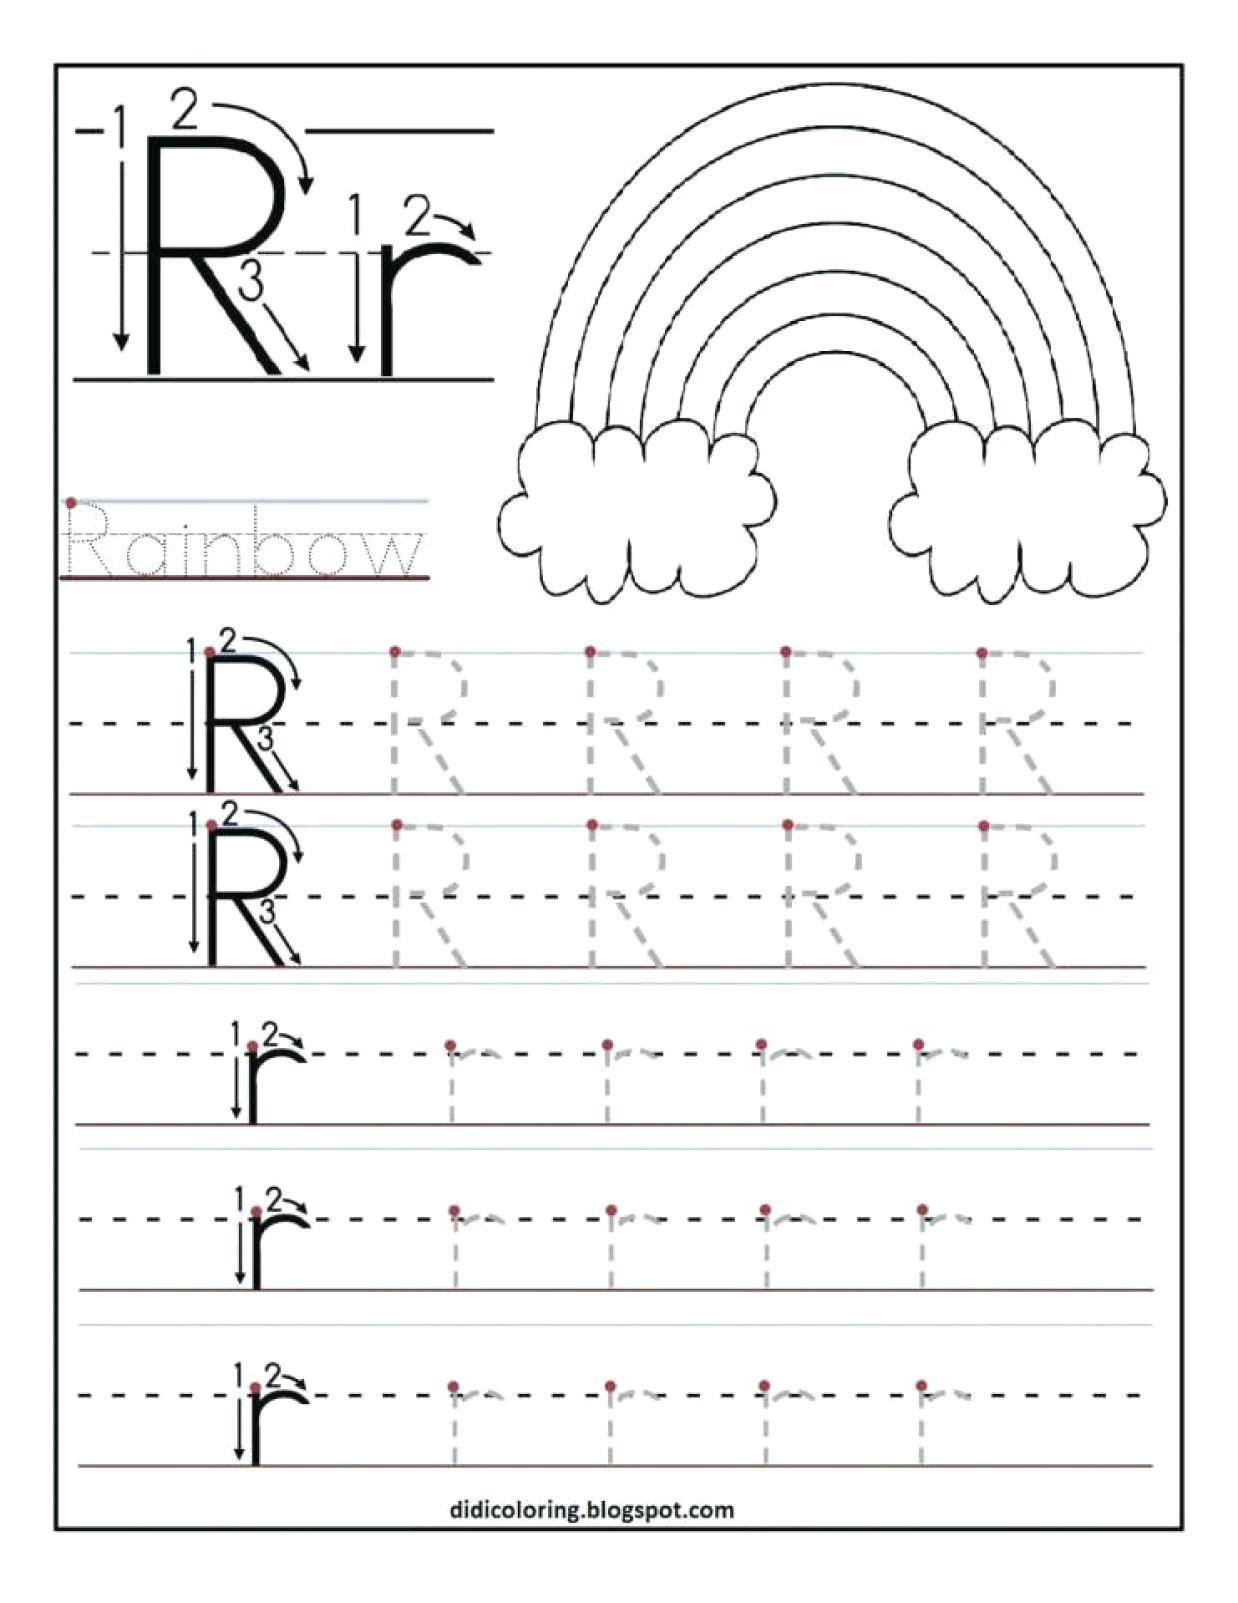 Learning To Write Letters E Worksheets Kids Free Cursive inside Tracing Letter S Worksheets For Kindergarten